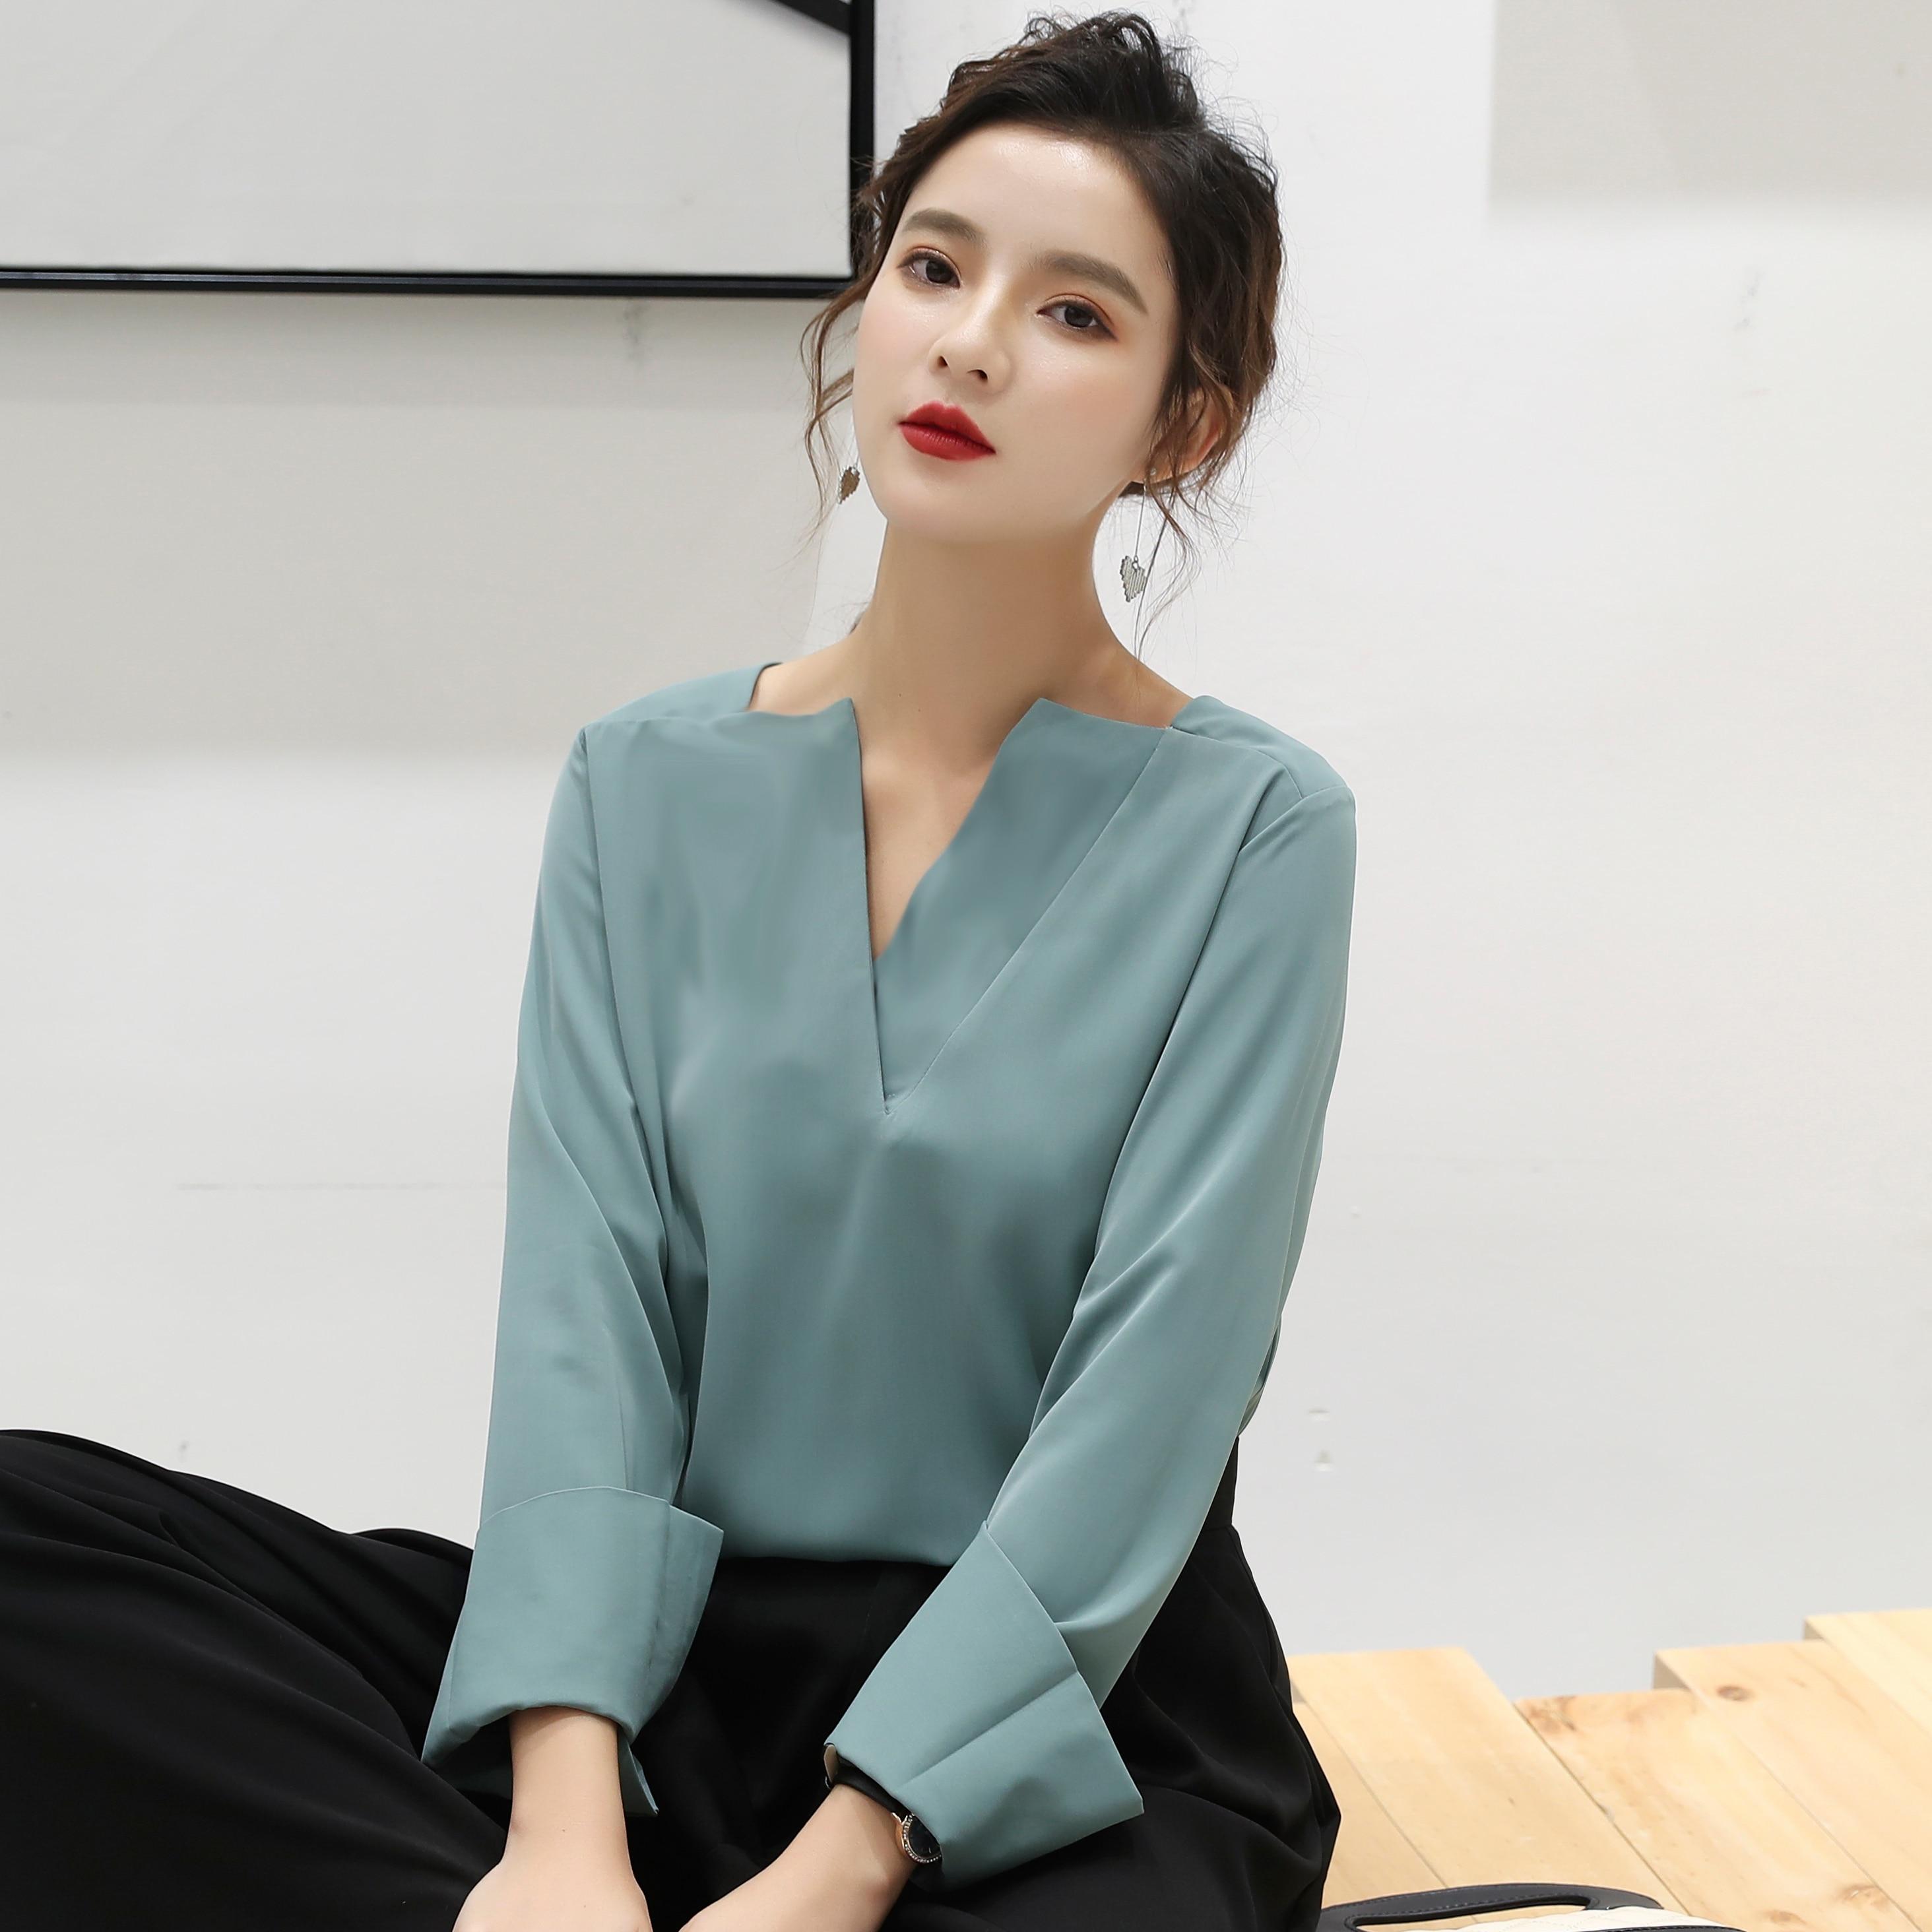 F9110 2019 New Autumn Winter Women Fashion Casual Ladies Work Shirts Korean  Harajuku  Womens Tops